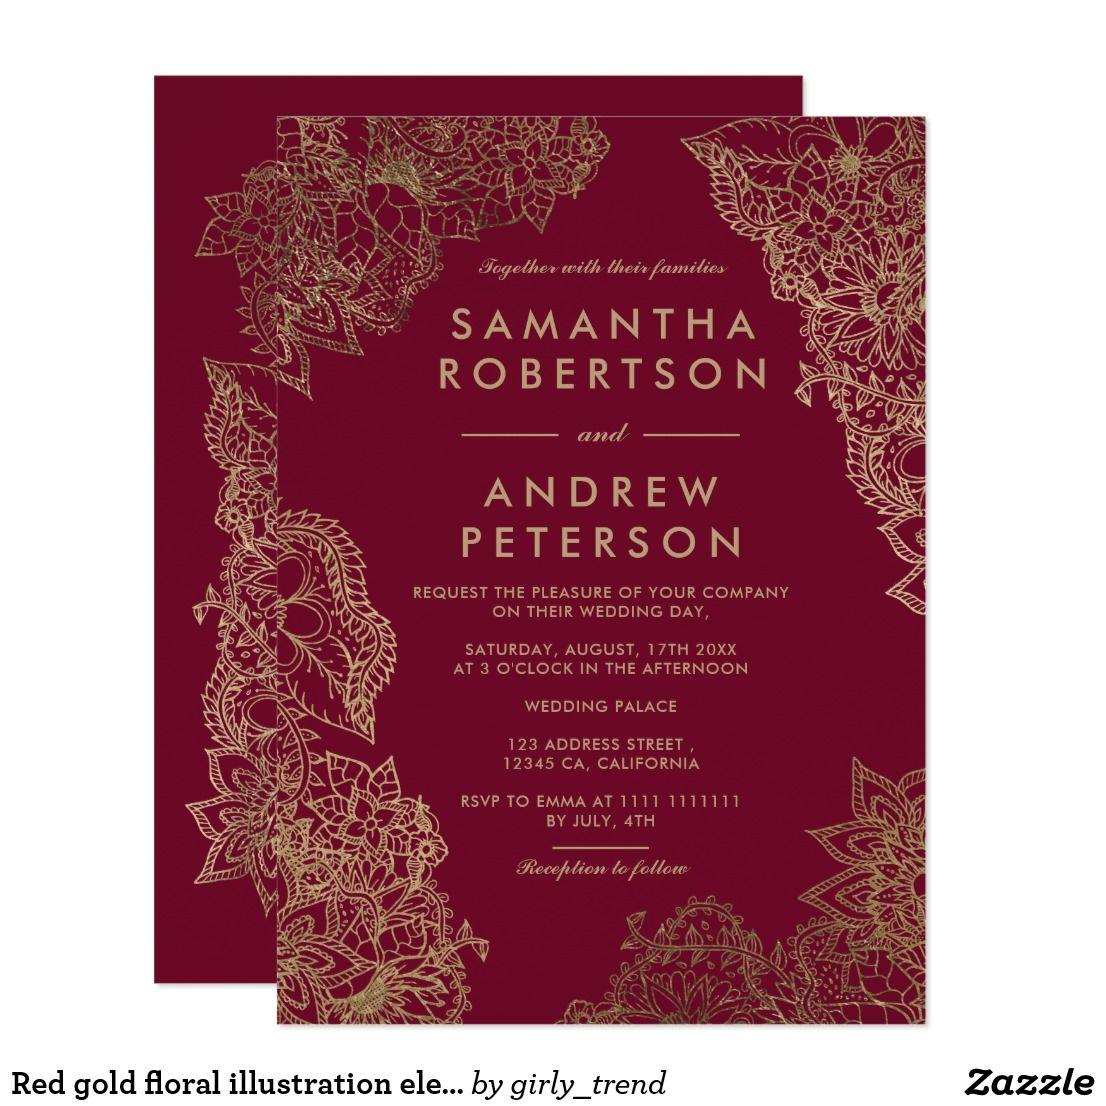 Red gold floral illustration elegant wedding invitation   Wedding ...